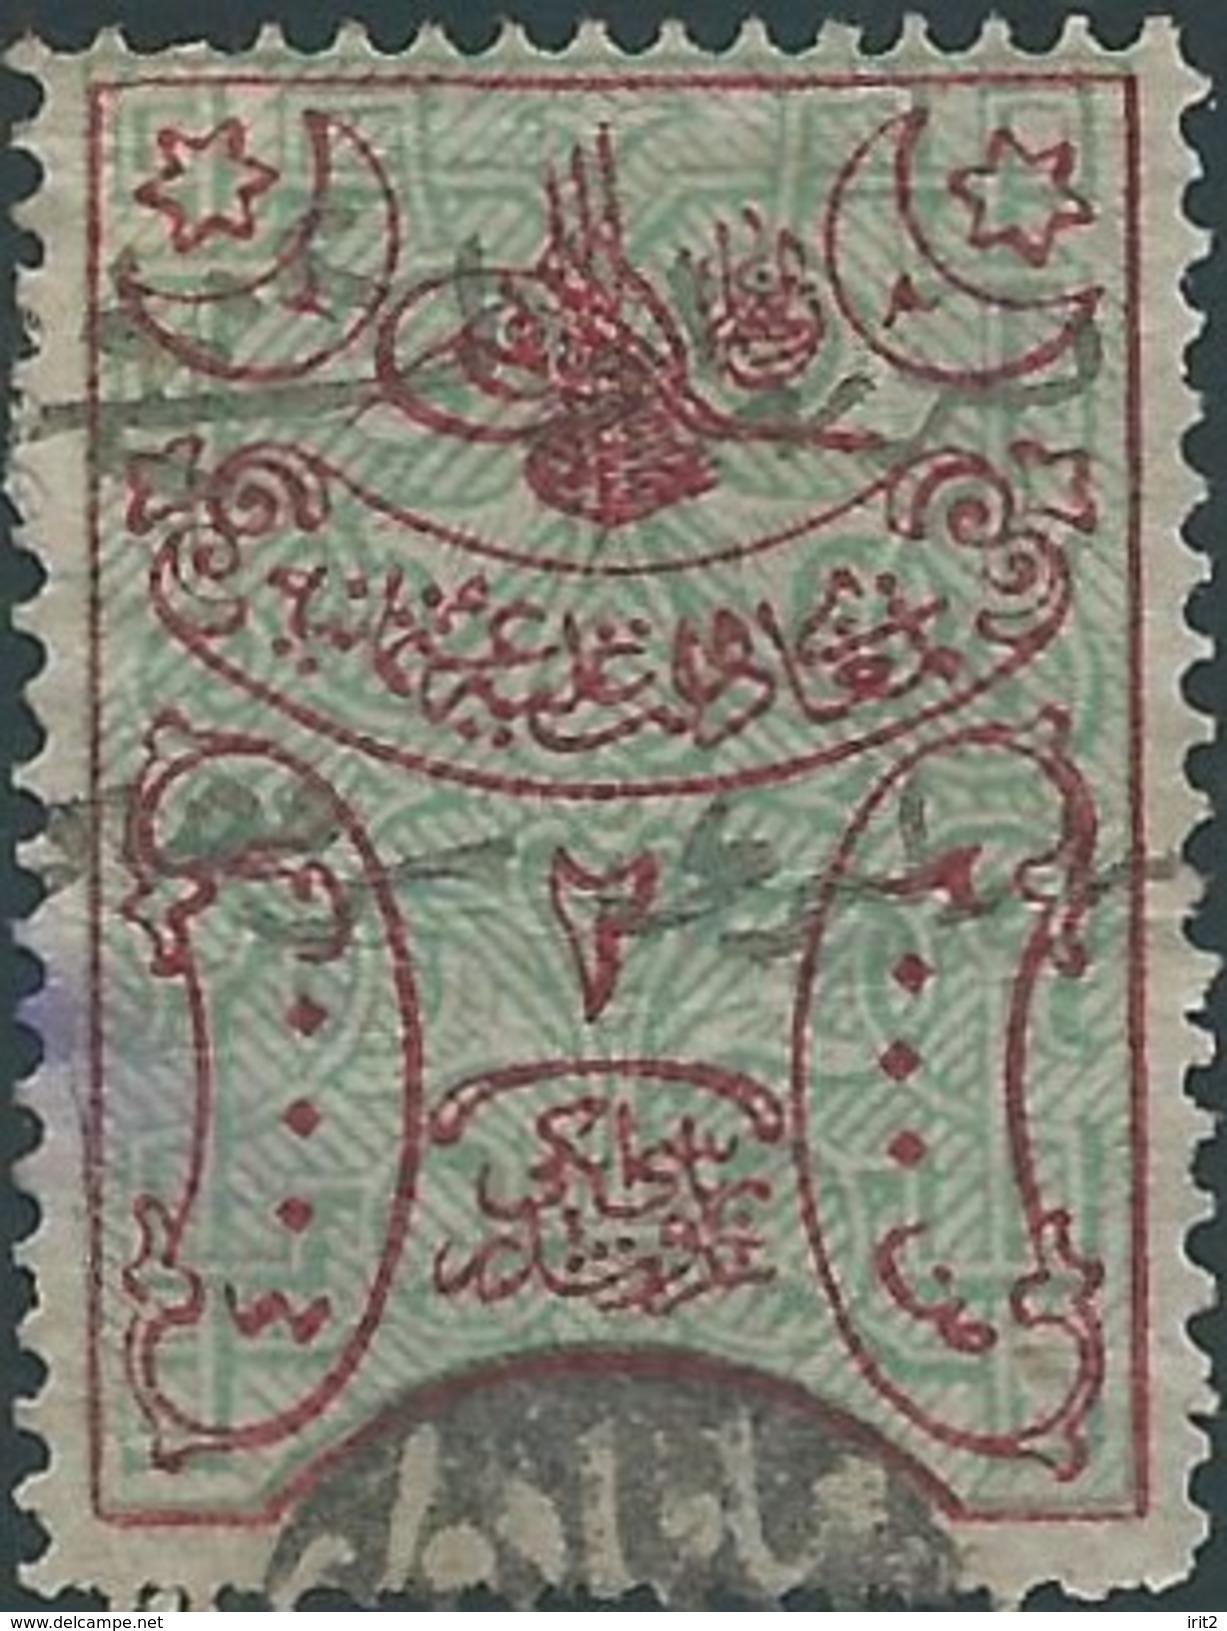 TURCHIA -TURKEY--Impero Ottomano - OTTOMAN--OSMANI 1858-1921 Fiscal Revenue Stamp,2Pa - 2000/4000 - Used Stamps